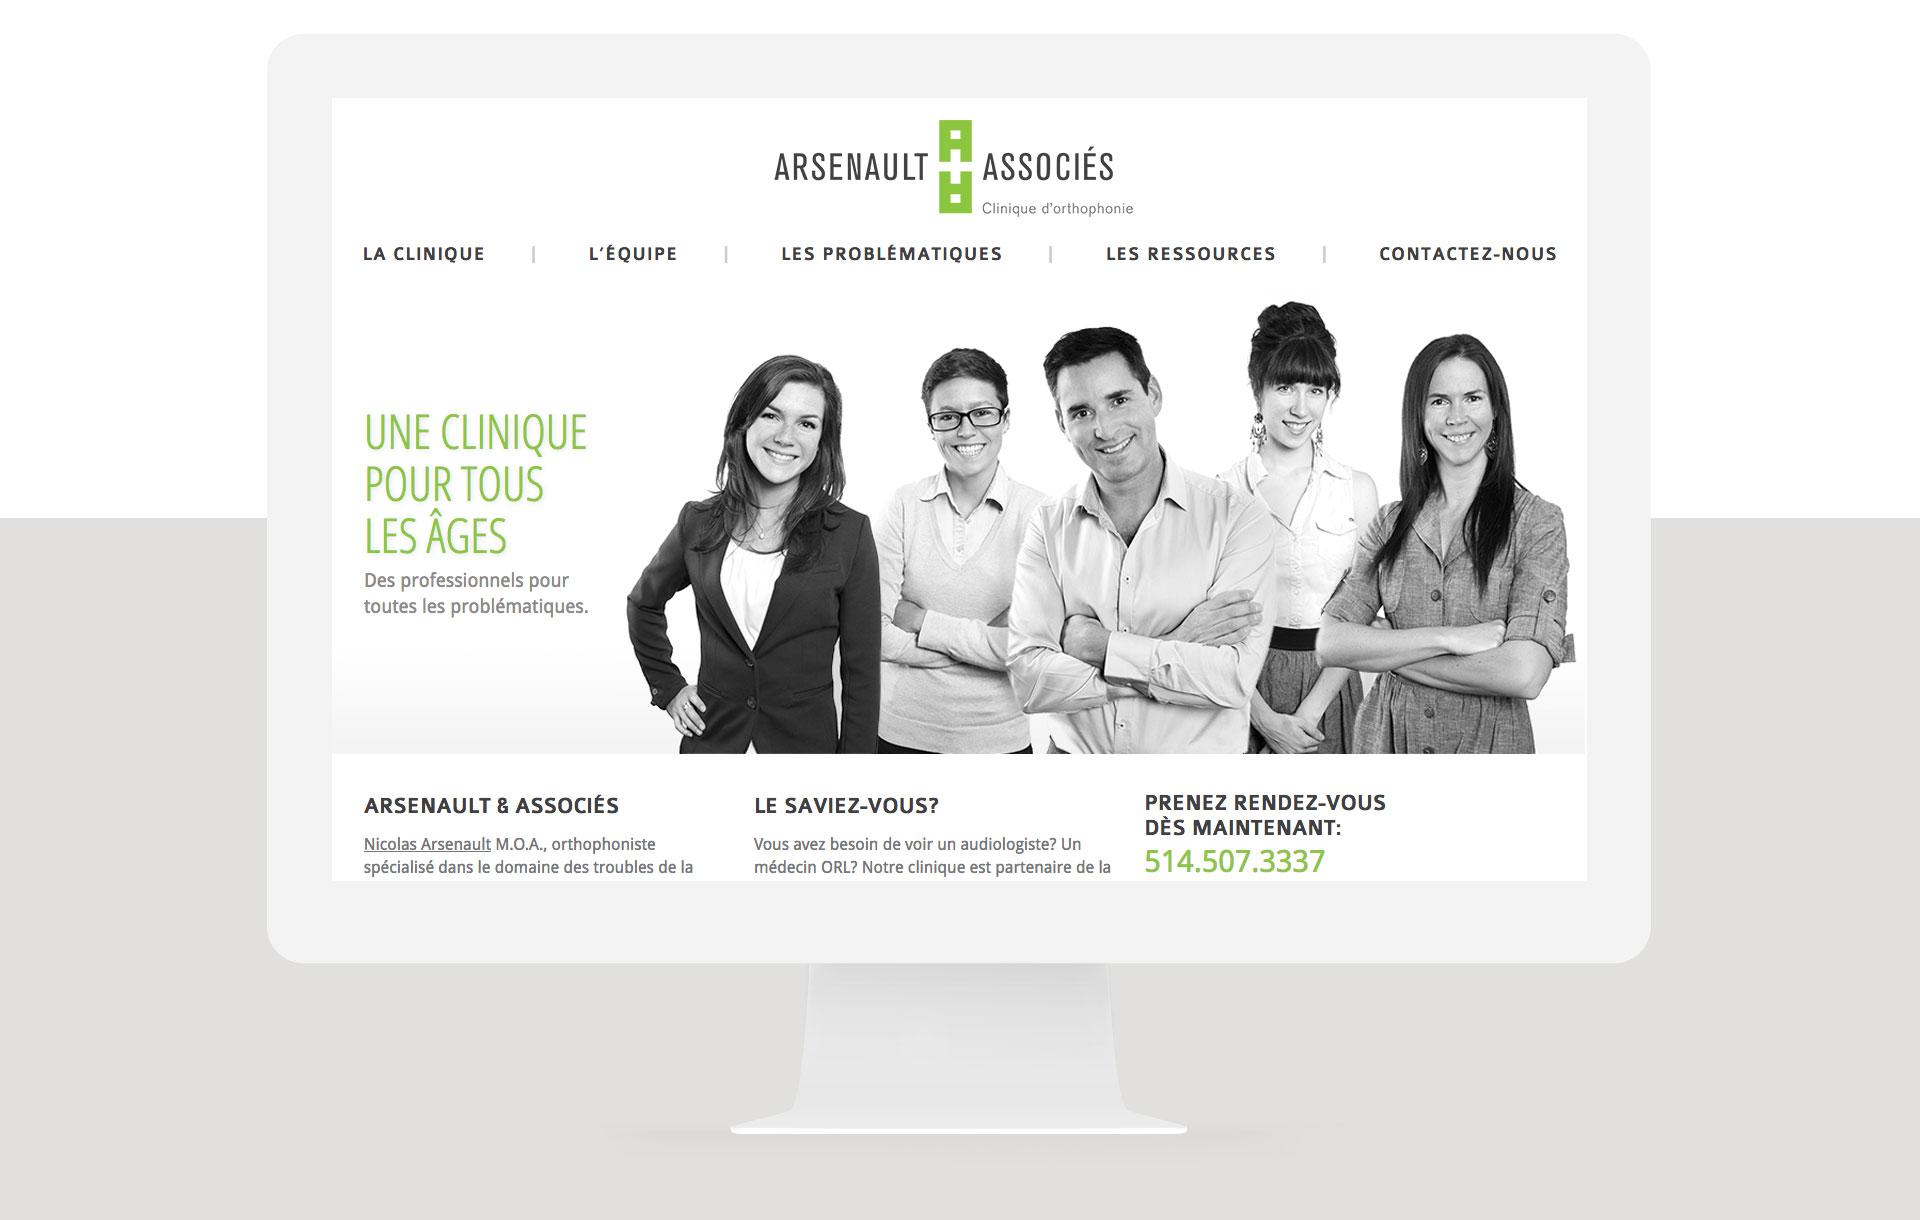 Arsenault et Associés